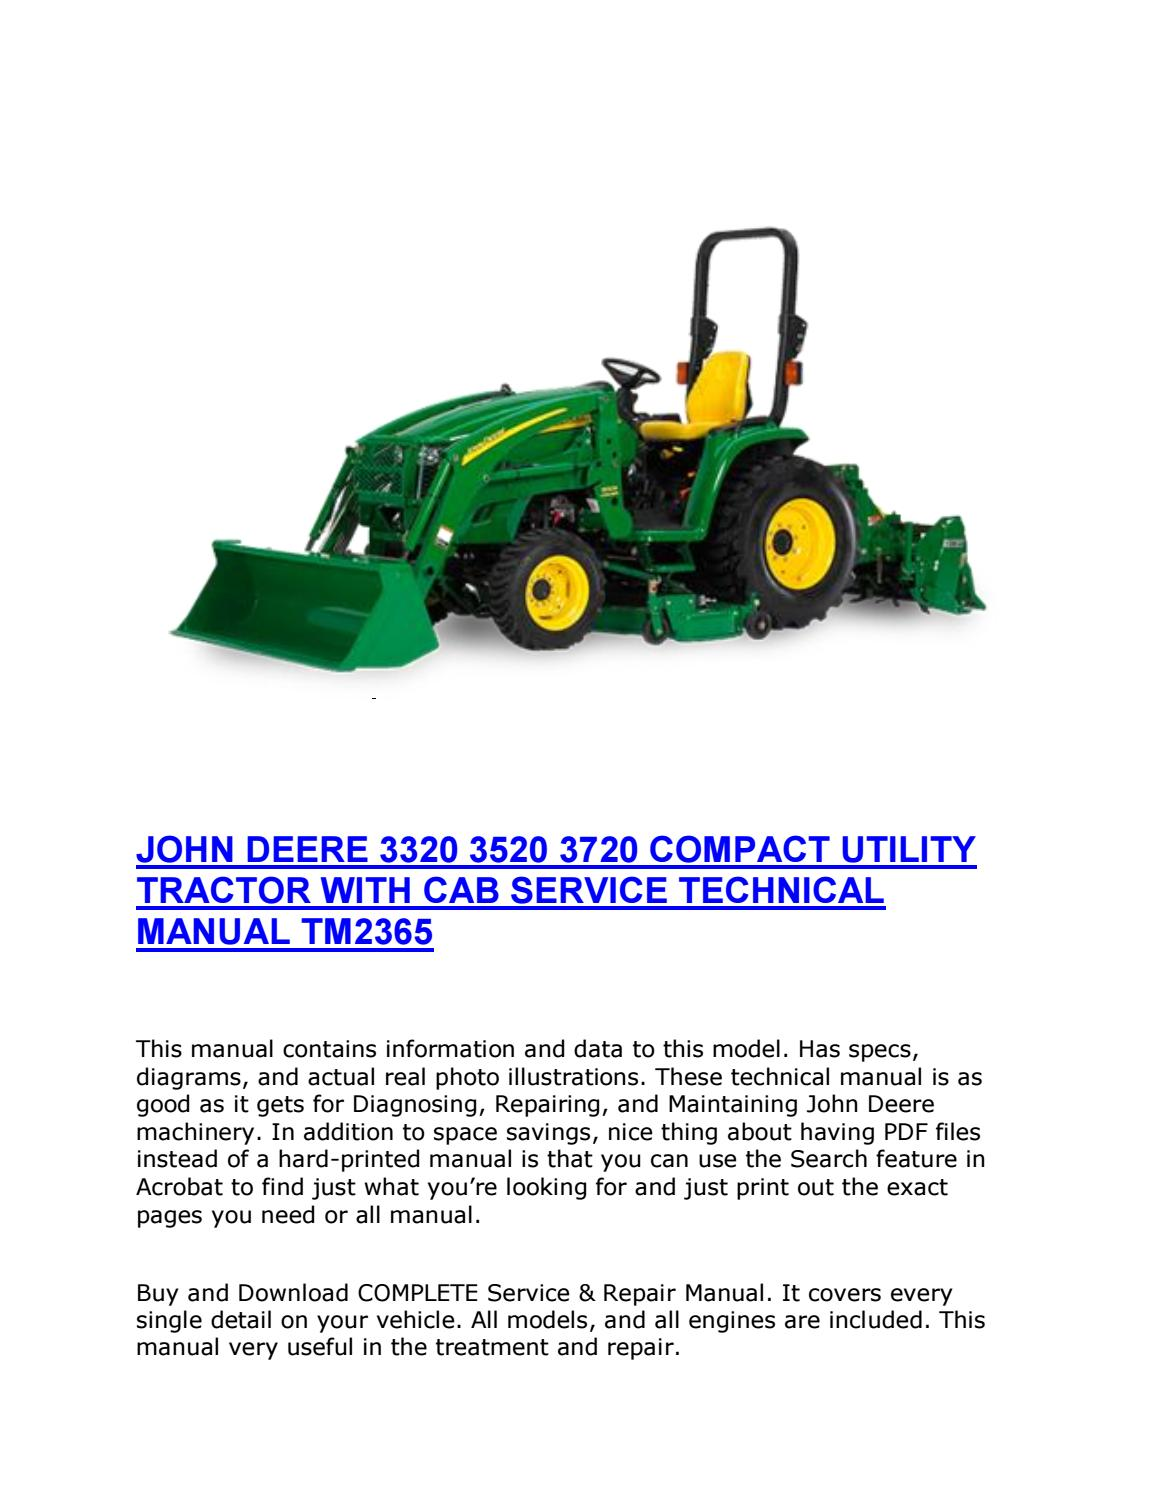 john deere 3720 service manual pdf